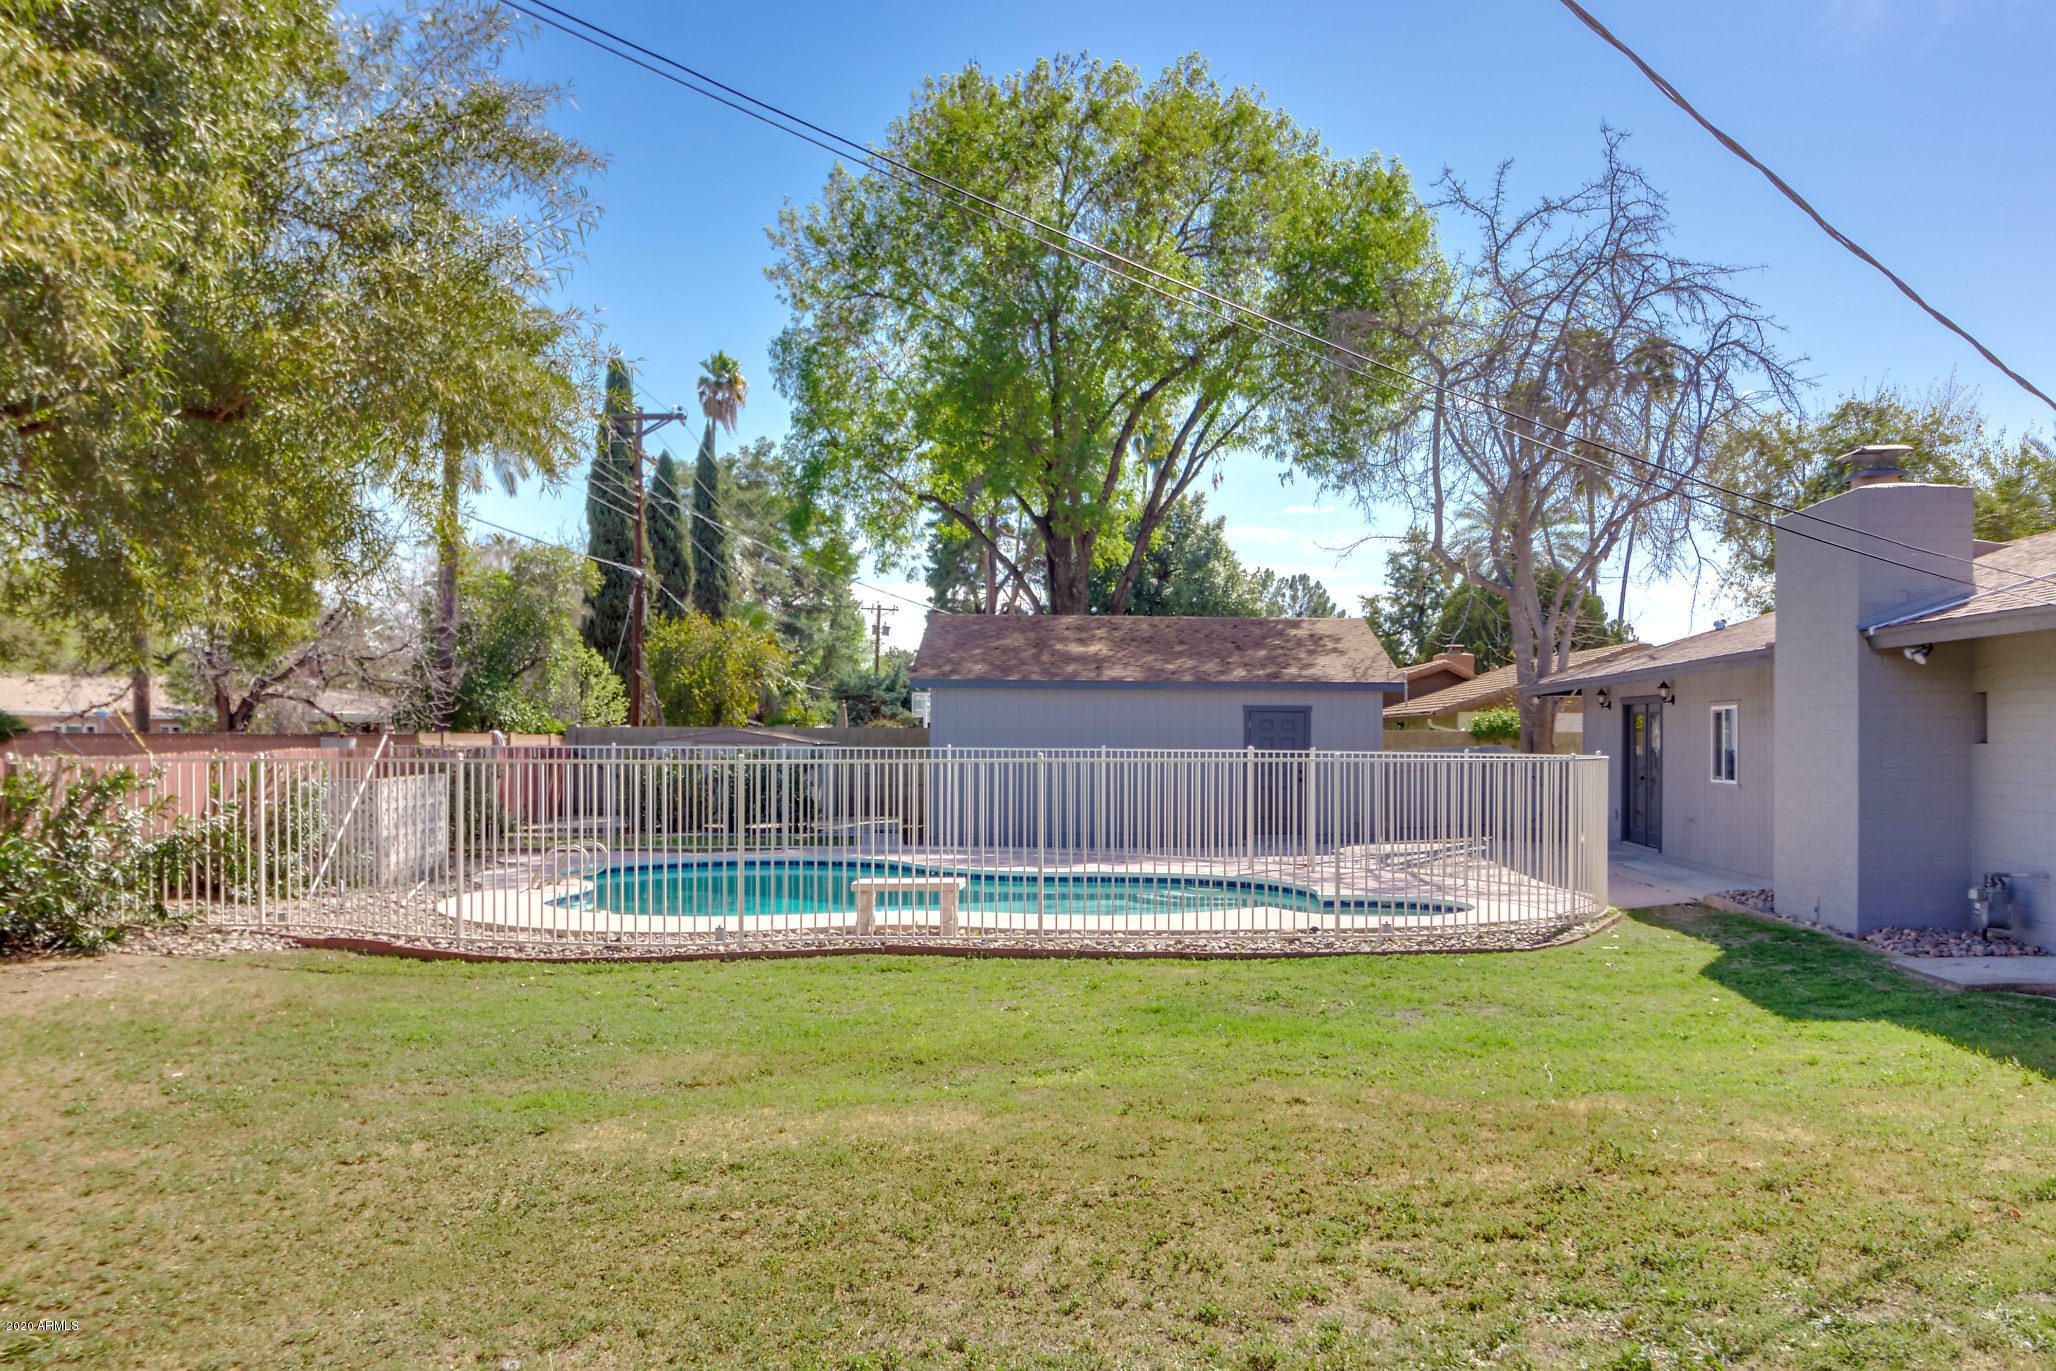 Photo of 7729 N 11TH Avenue, Phoenix, AZ 85021